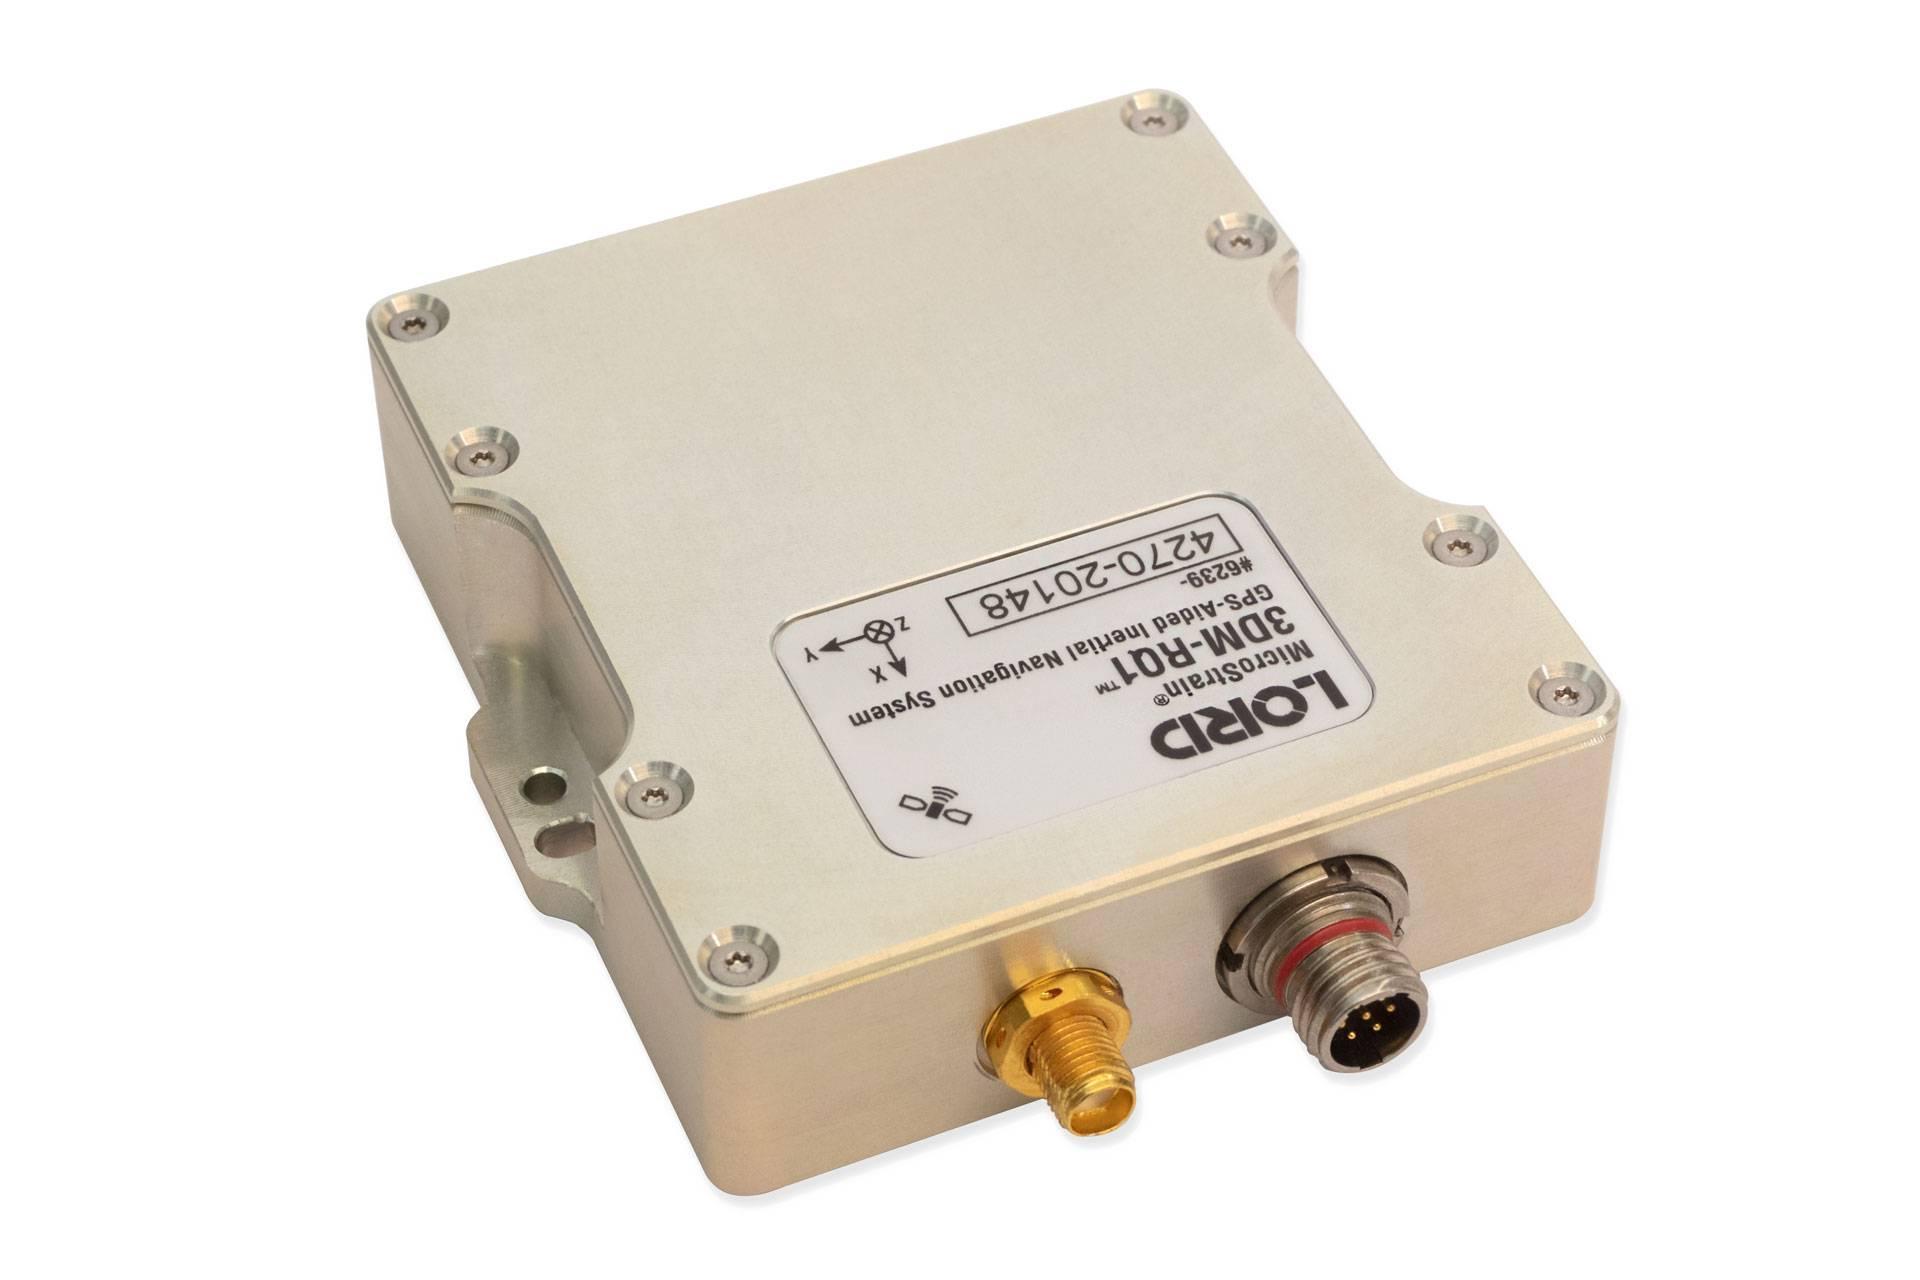 3DM-RQ1-45 GNSS/INS | LORD Sensing Systems